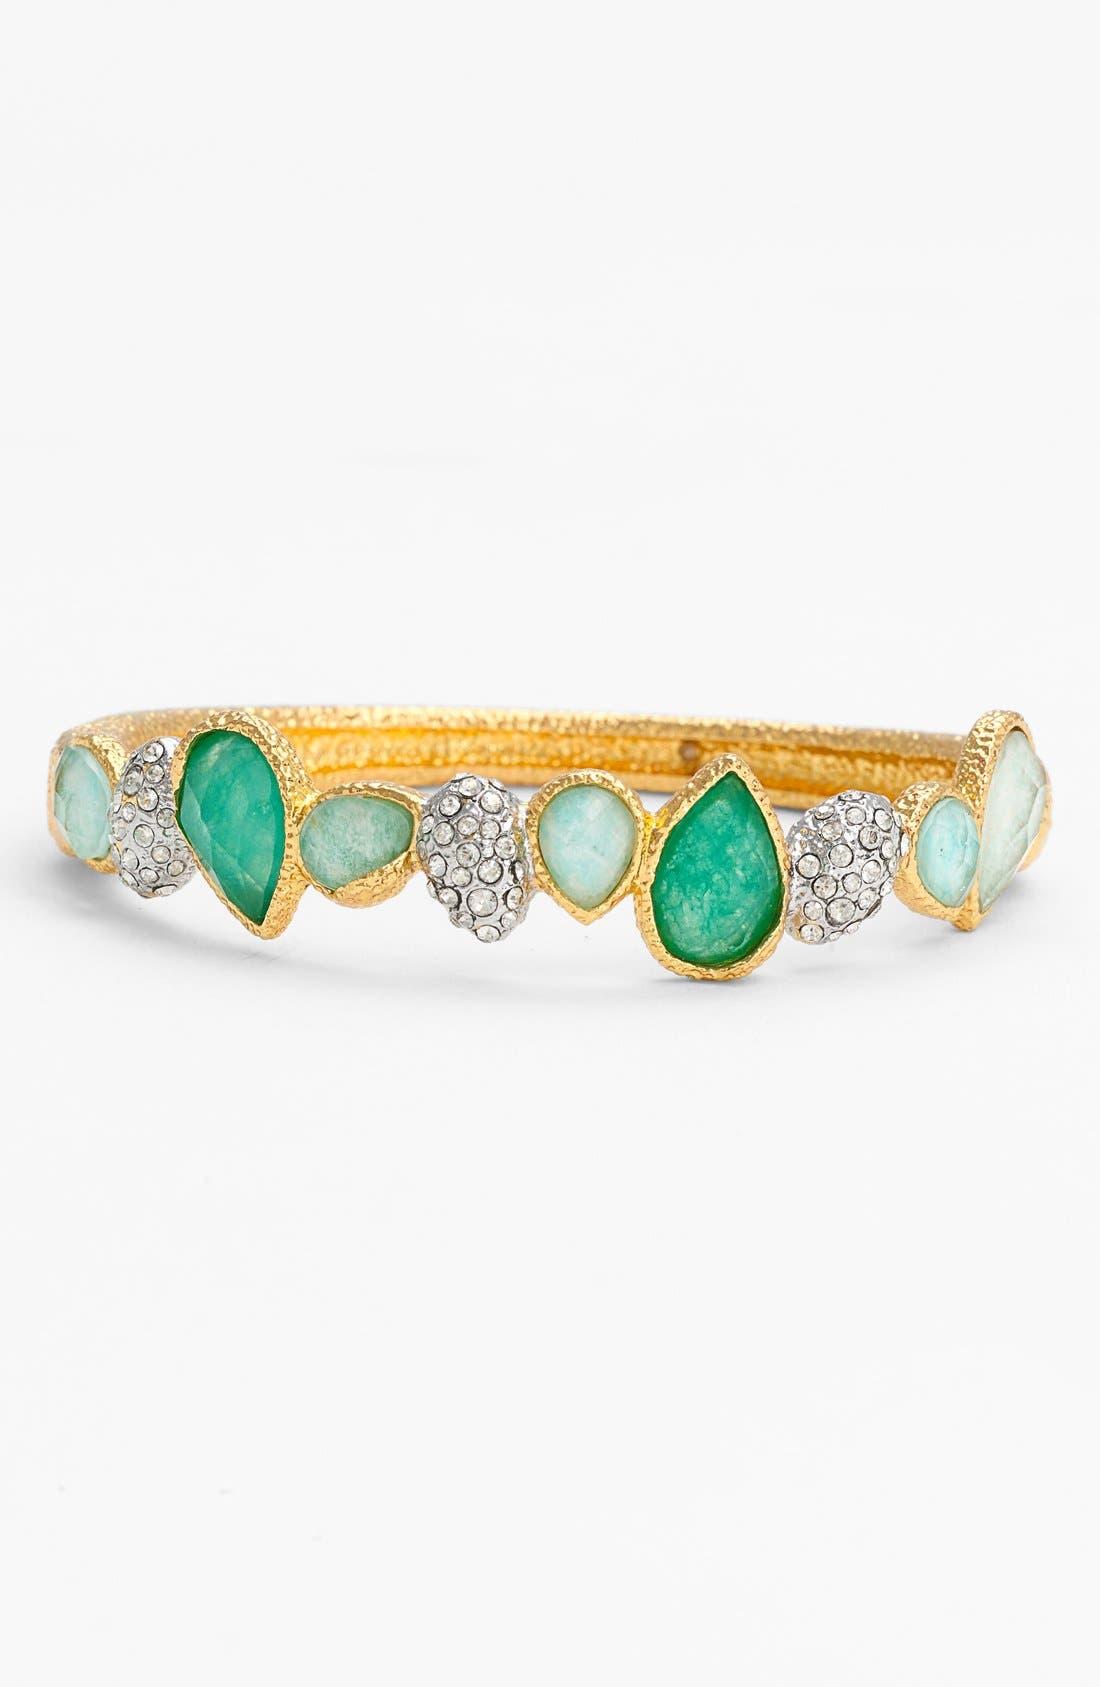 Alternate Image 1 Selected - Alexis Bittar 'Elements - Maldivian' Semiprecious Stone Bracelet